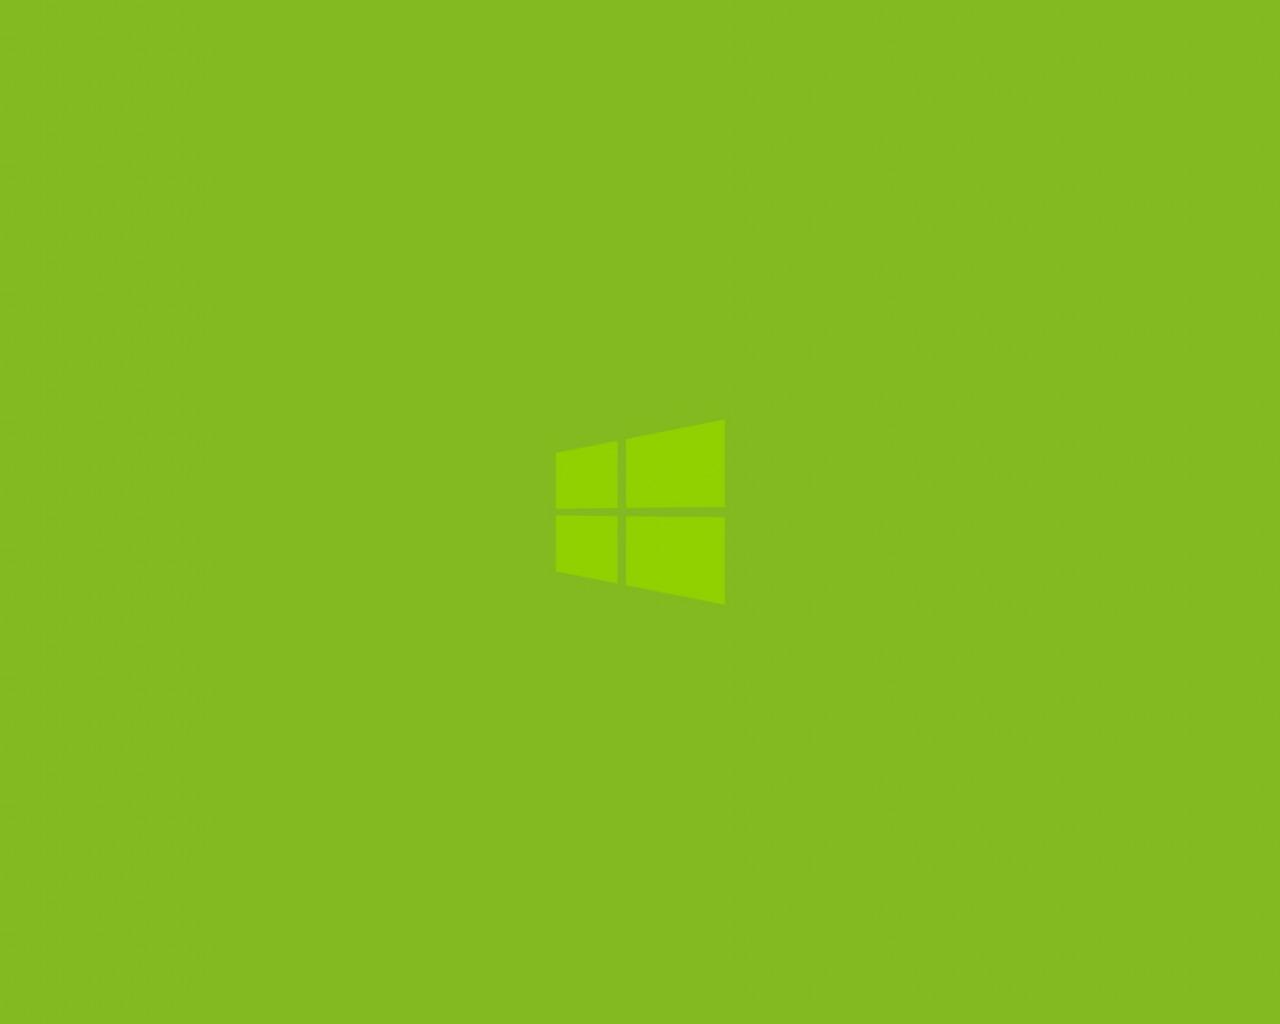 Wallpaper Windows 8  № 1929052 загрузить